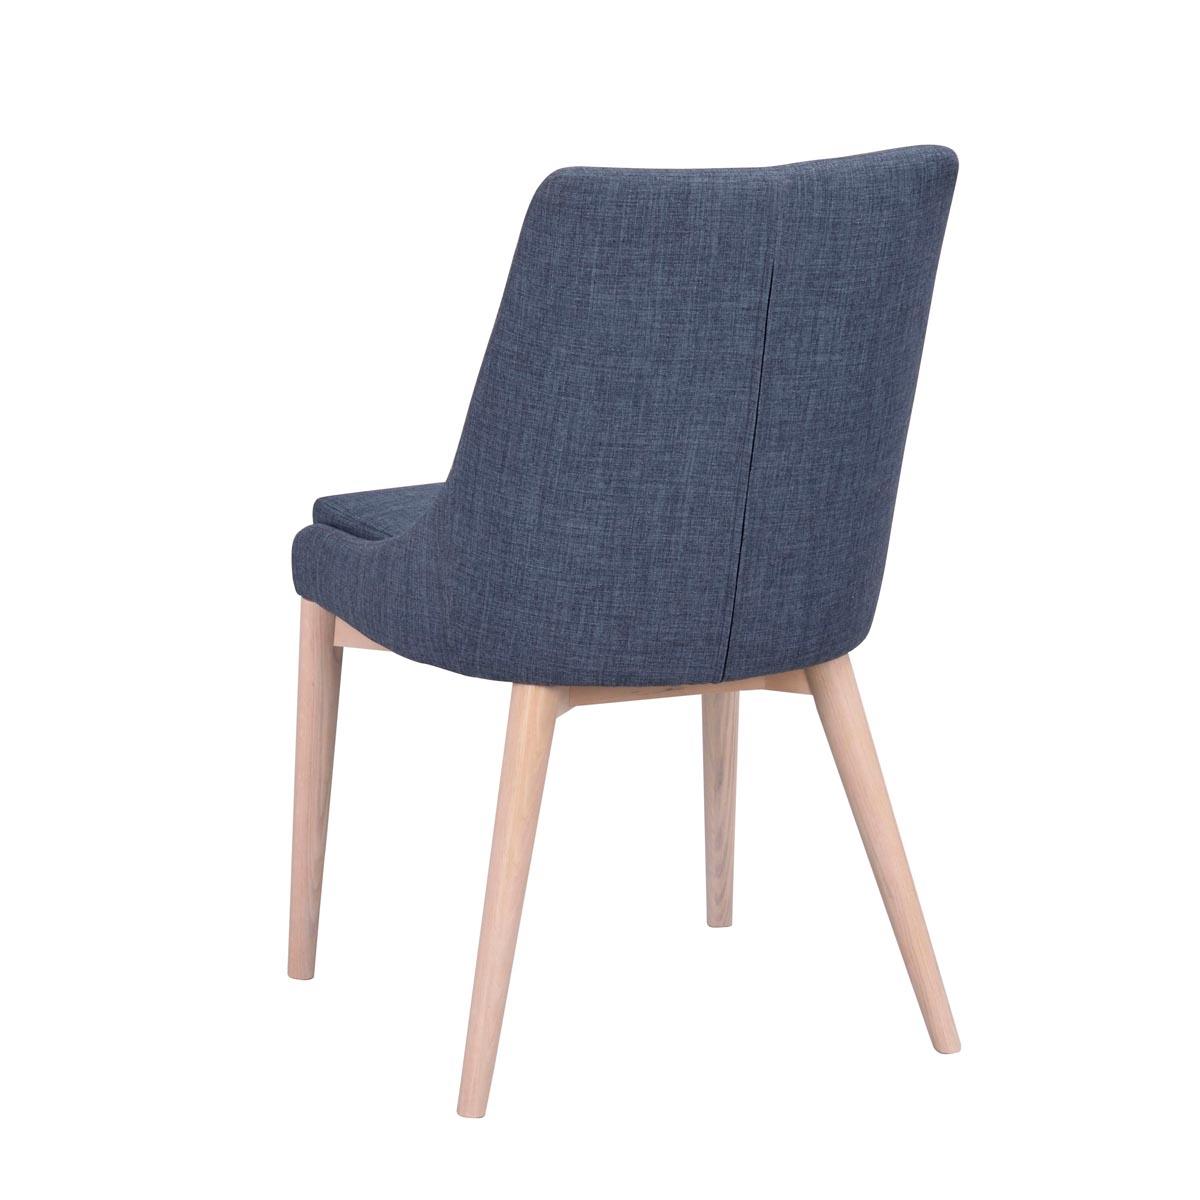 Bea-stol-blått-tyg_wwR-118317_d